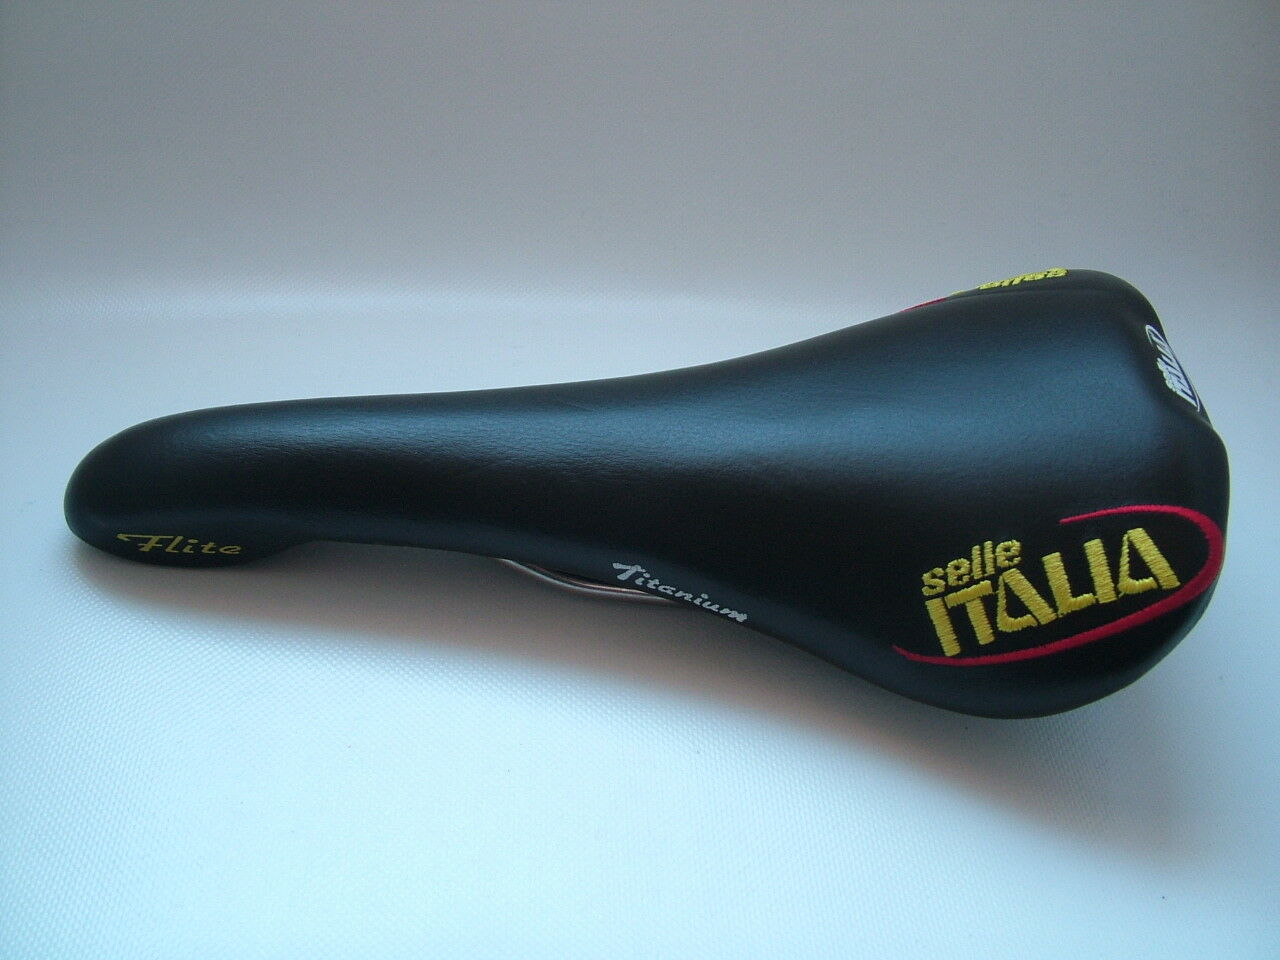 Selle italia Flite Titanium Saddle